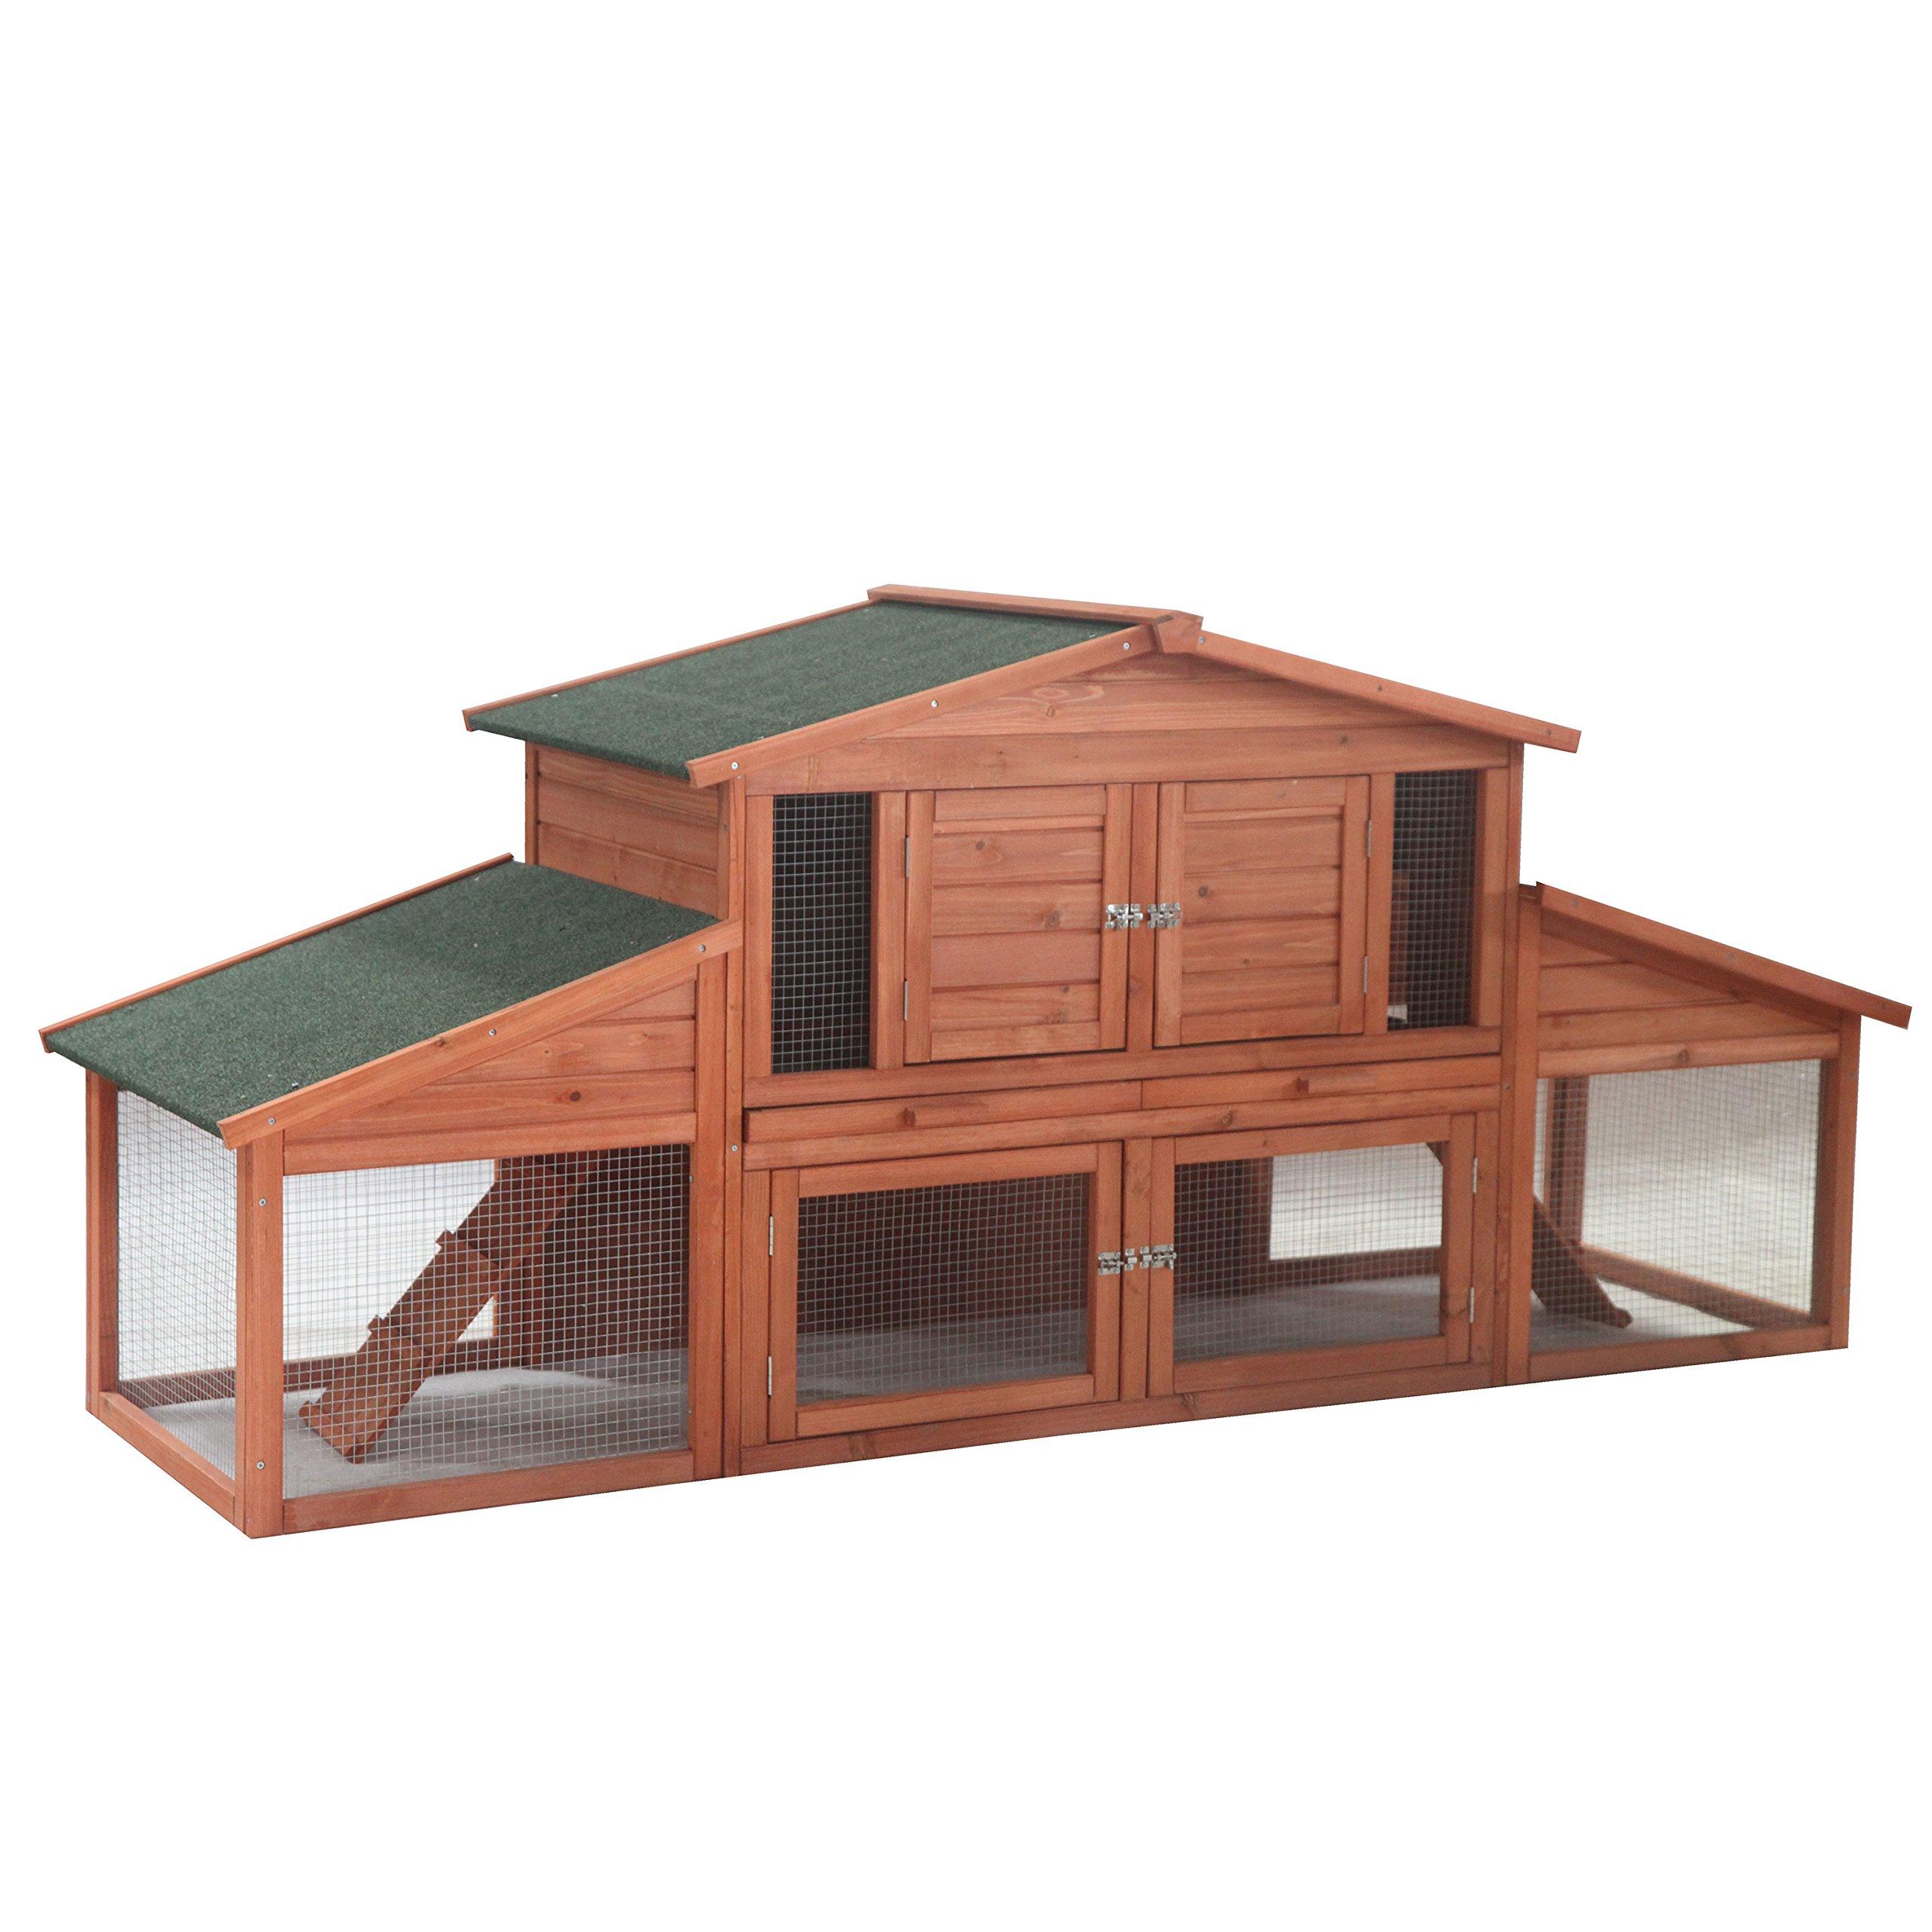 ALEKO ACCRH91X28X39 Wooden Pet House Chicken Coop Rabbit Hutch 91 x 28 x 39 Inches